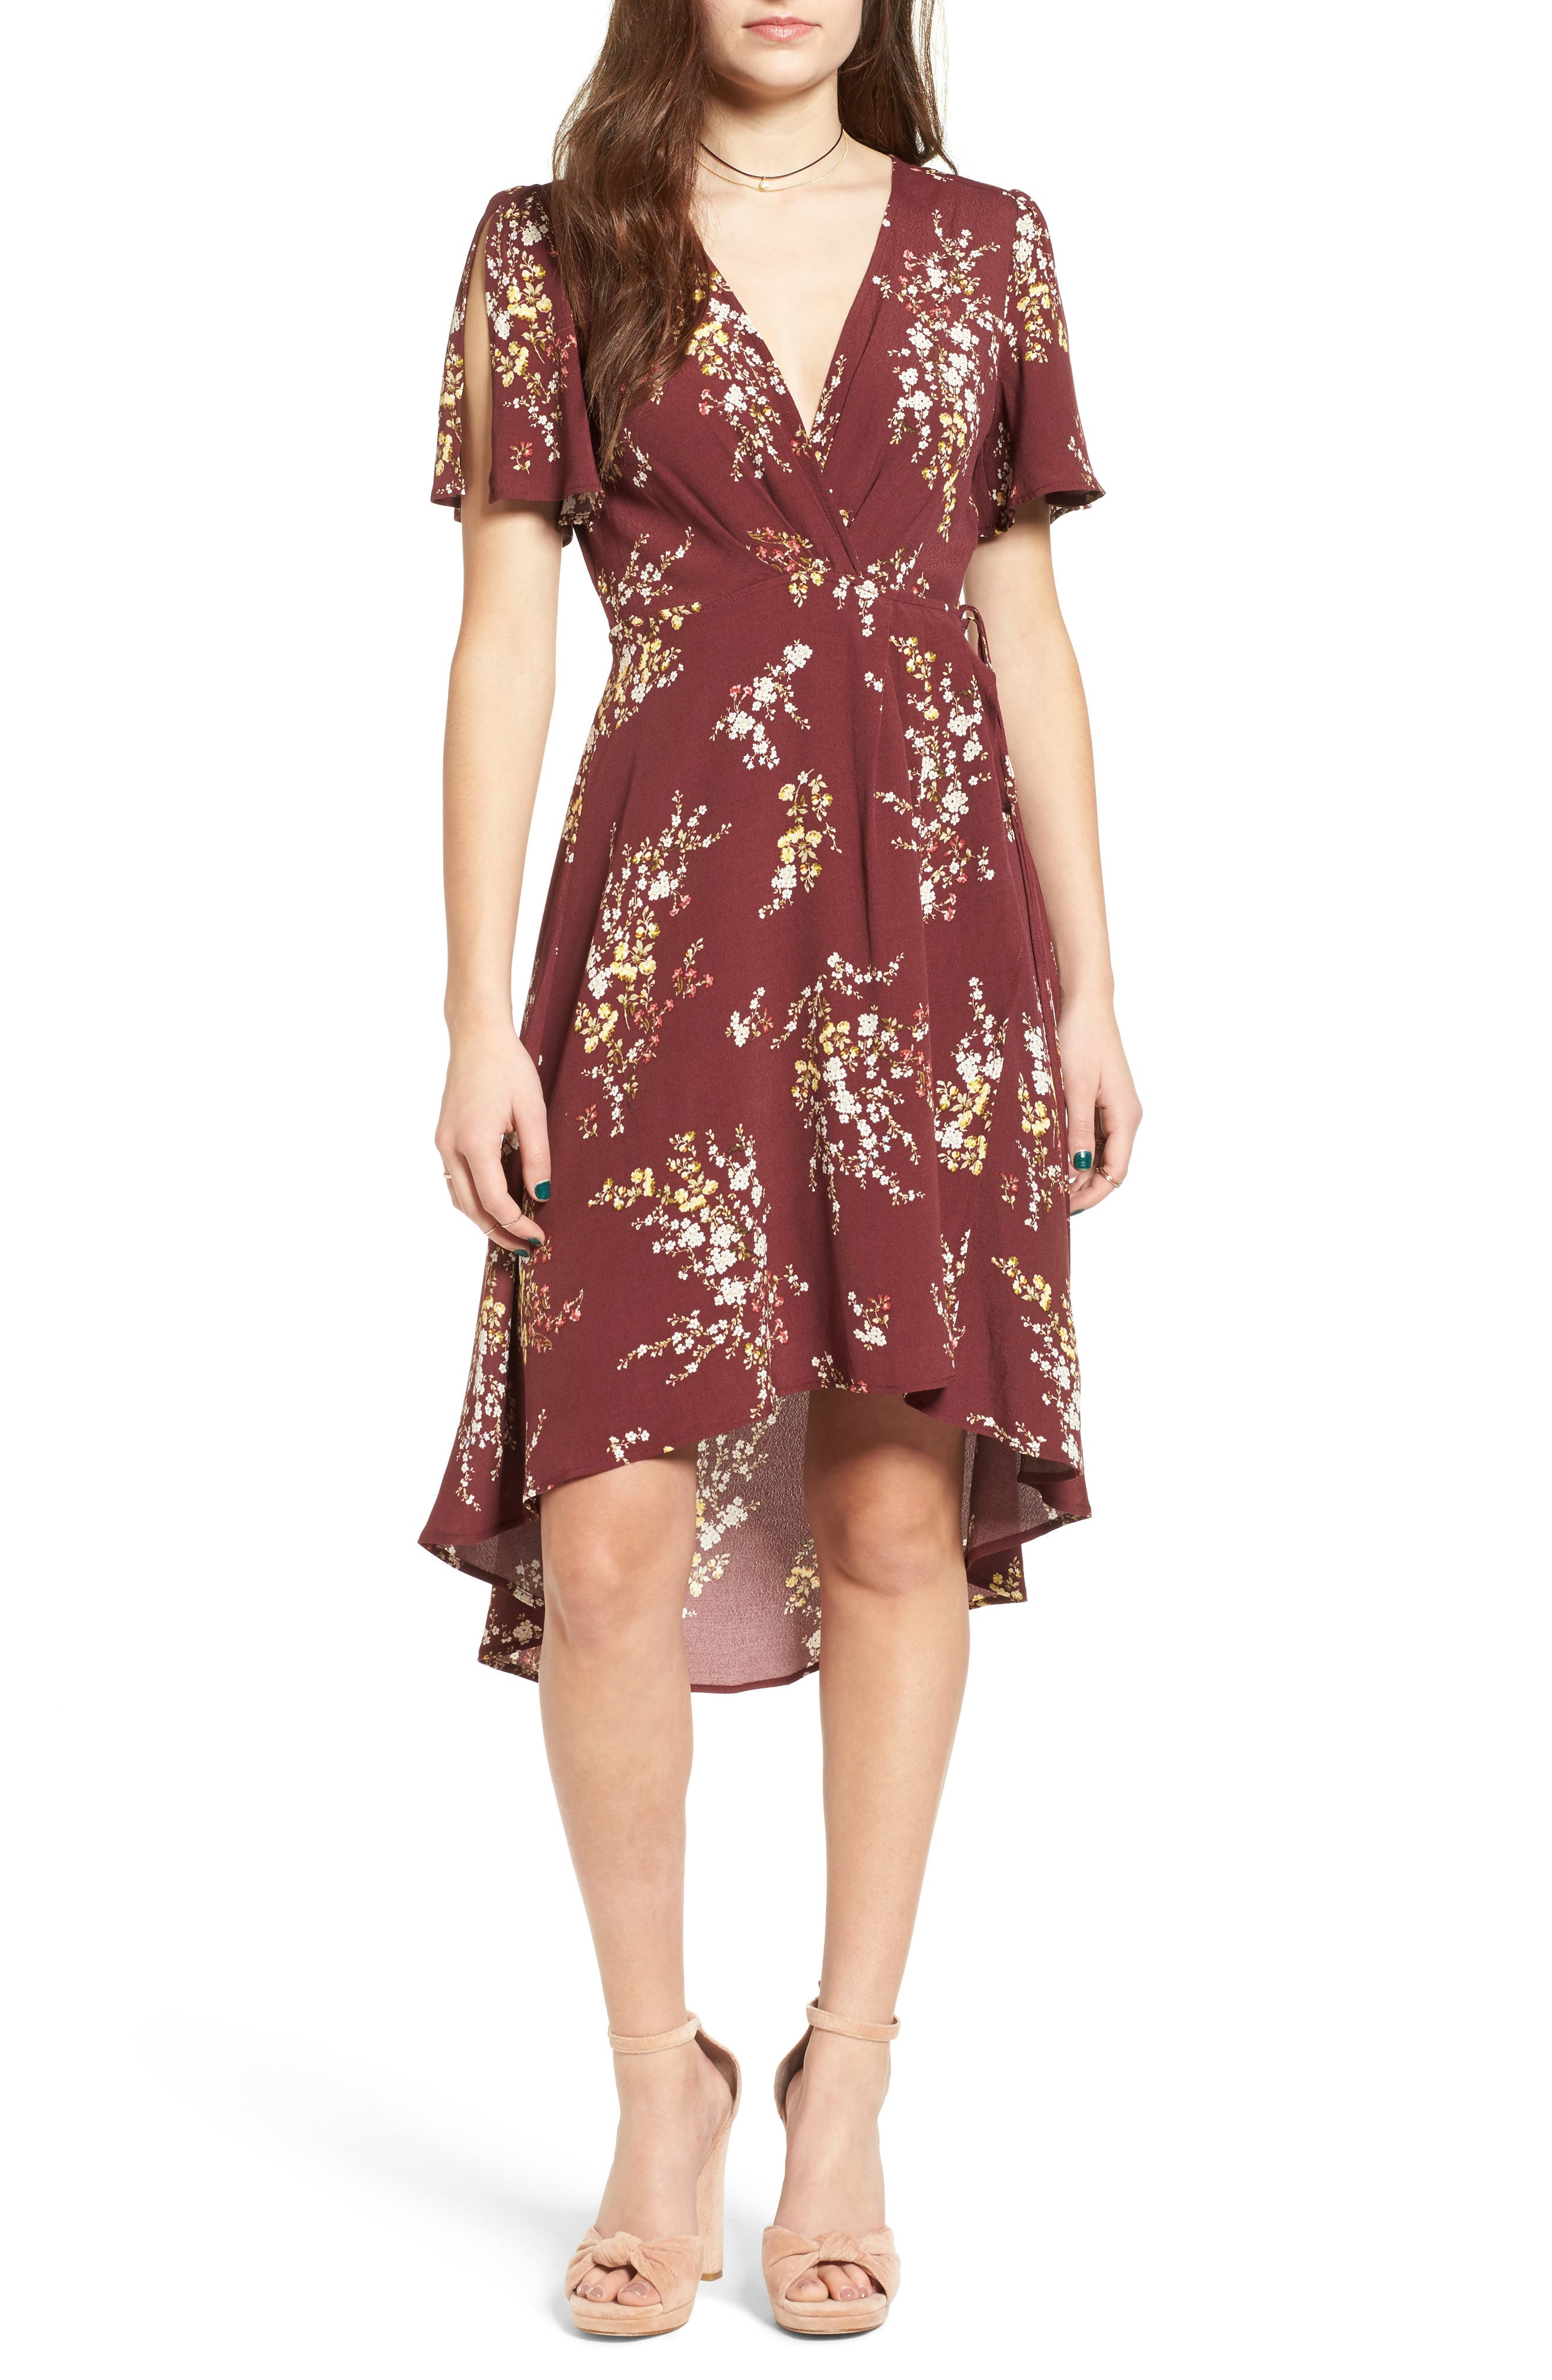 Alternate Image 1 Selected - ASTR the Label Adeline Floral Print Wrap Dress